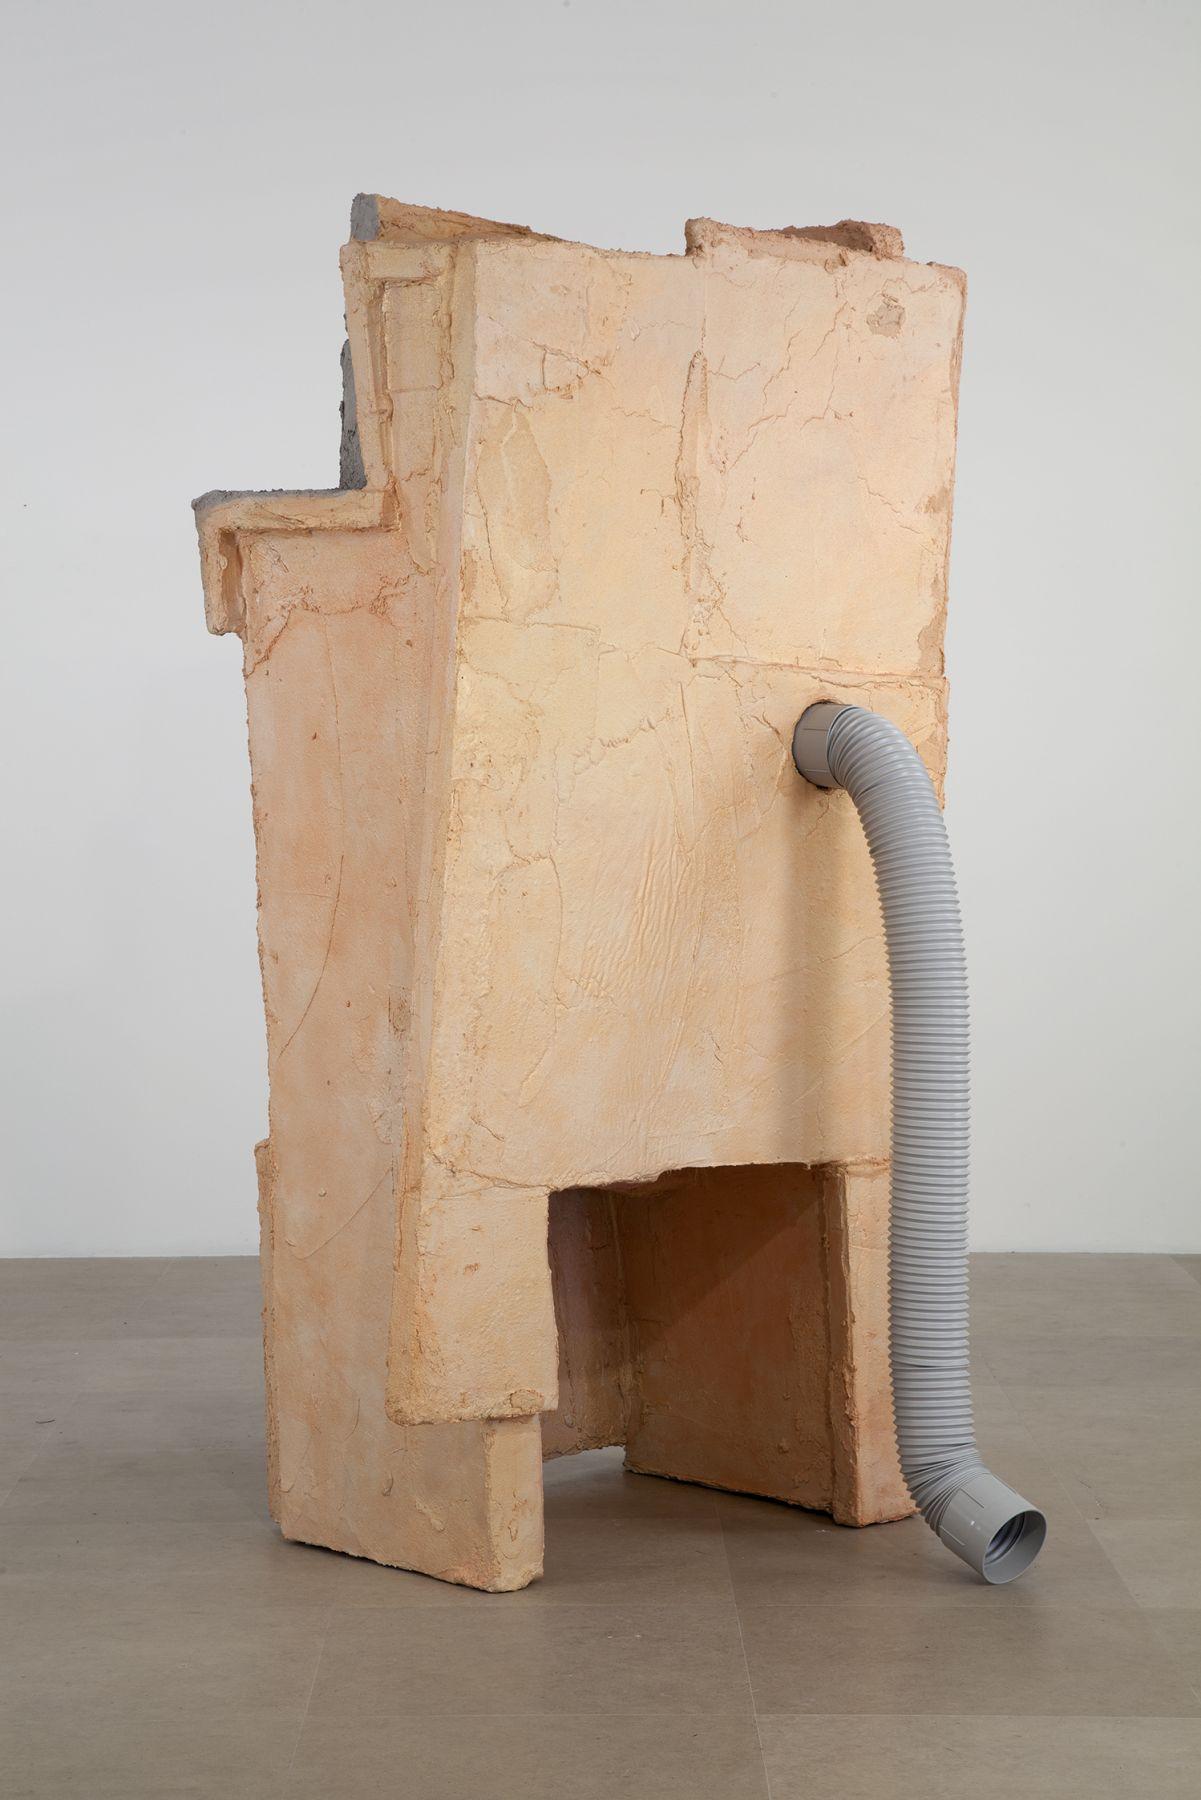 Rachel Harrison Industrial Poems, 2012 Wood, polystyrene, cement, acrylic, and plastic ventilation tube 85 x 46 x 46 inches (215.9 x 116.8 x 116.8 cm)